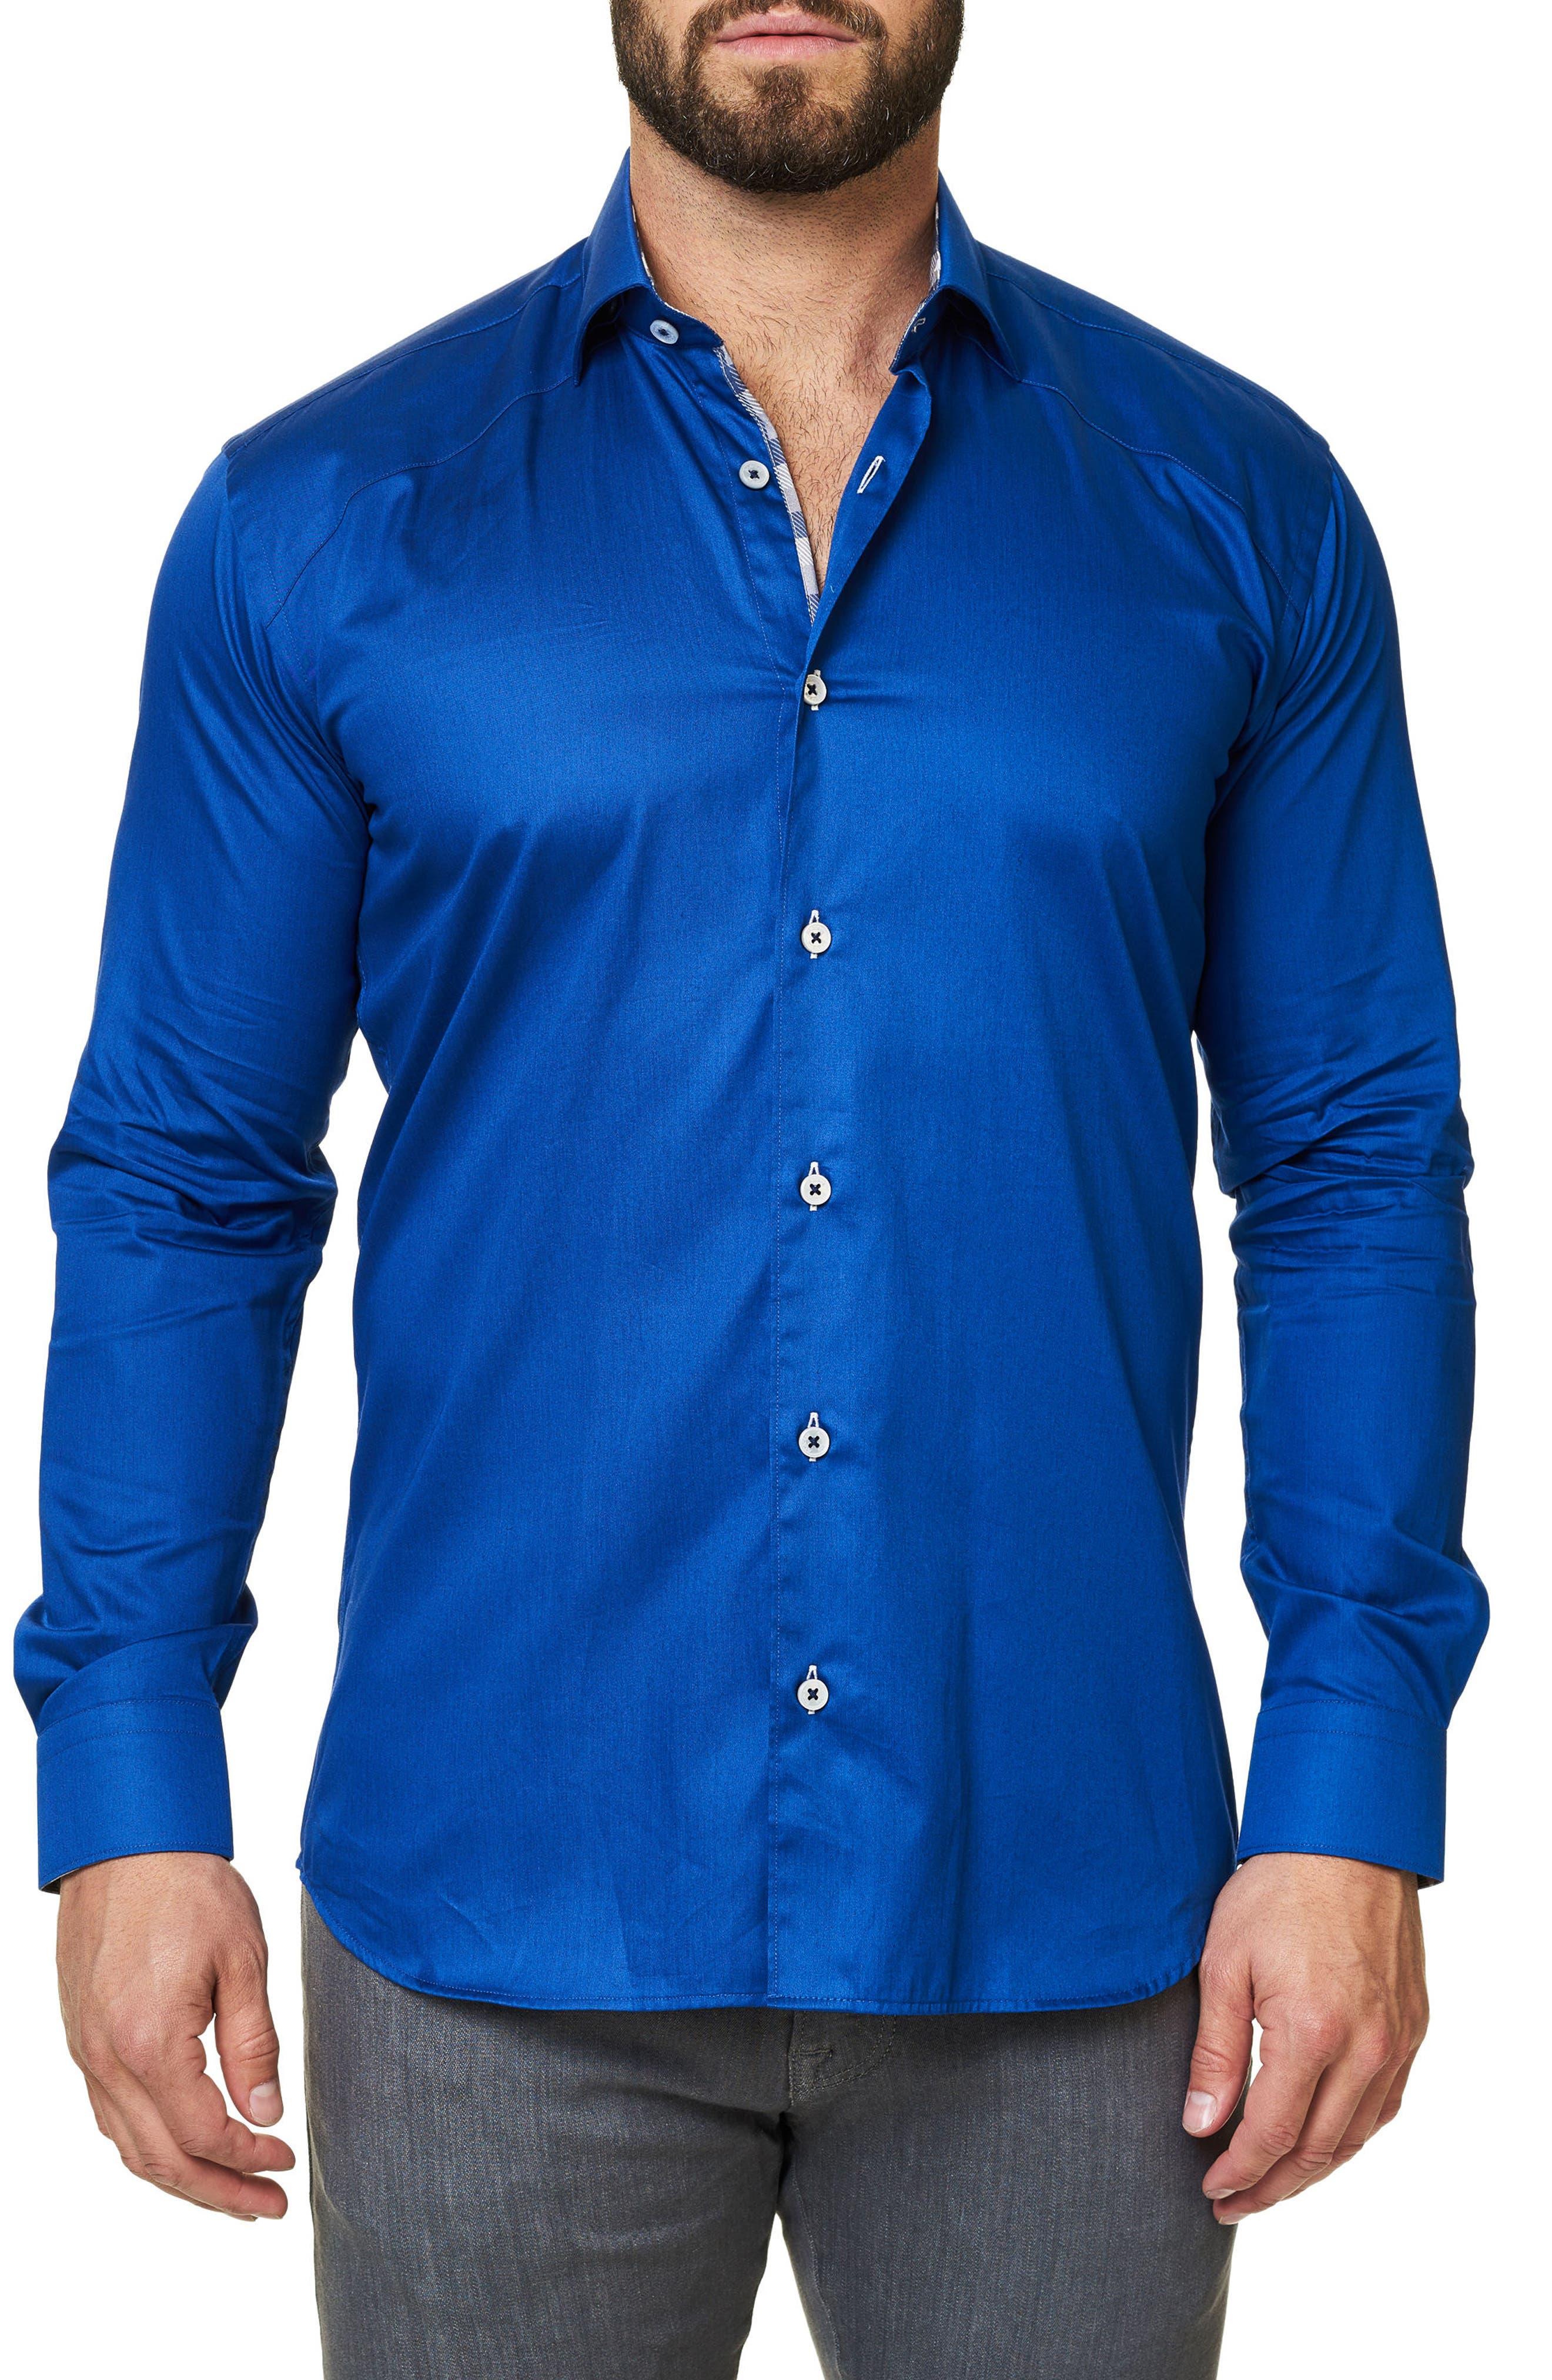 Main Image - Maceoo Trim Fit Sport Shirt